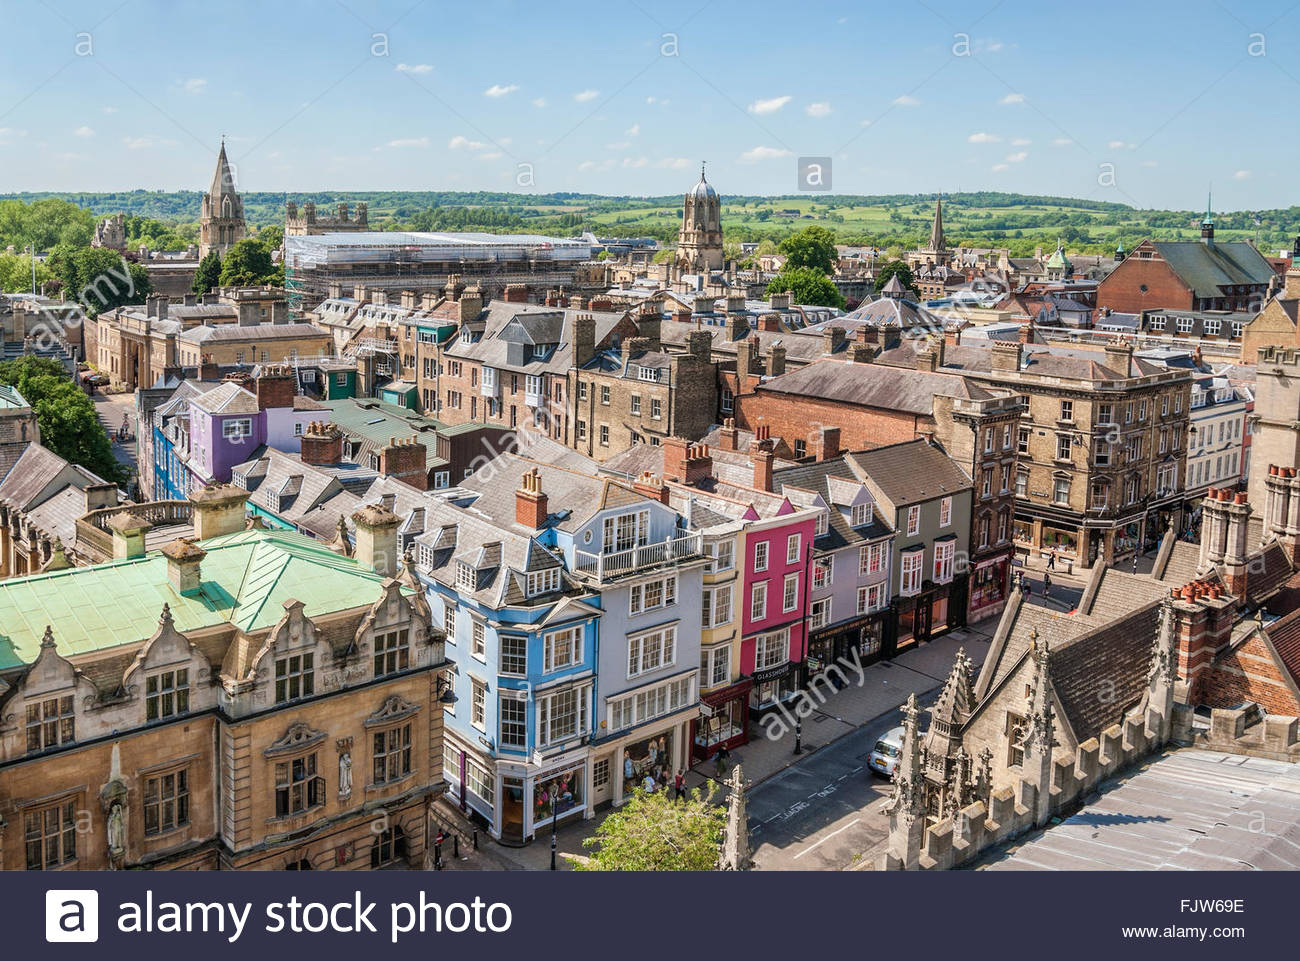 Skyline médiévale de l'université Oxford Ville en Angleterre. | Aussicht über die Altstadt Photo Stock